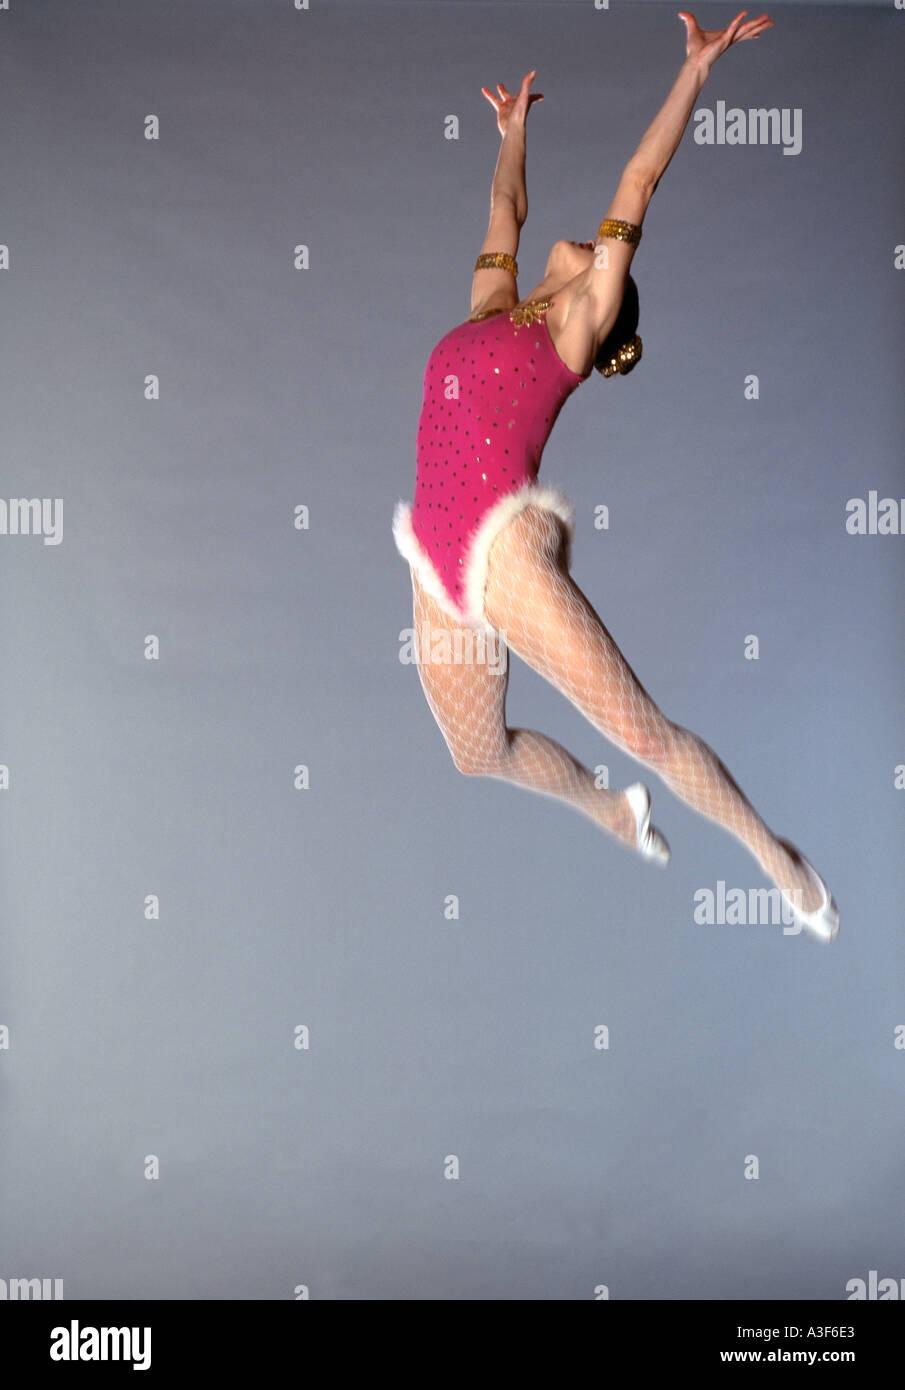 Trapecista volando por el aire fondo gris Foto de stock